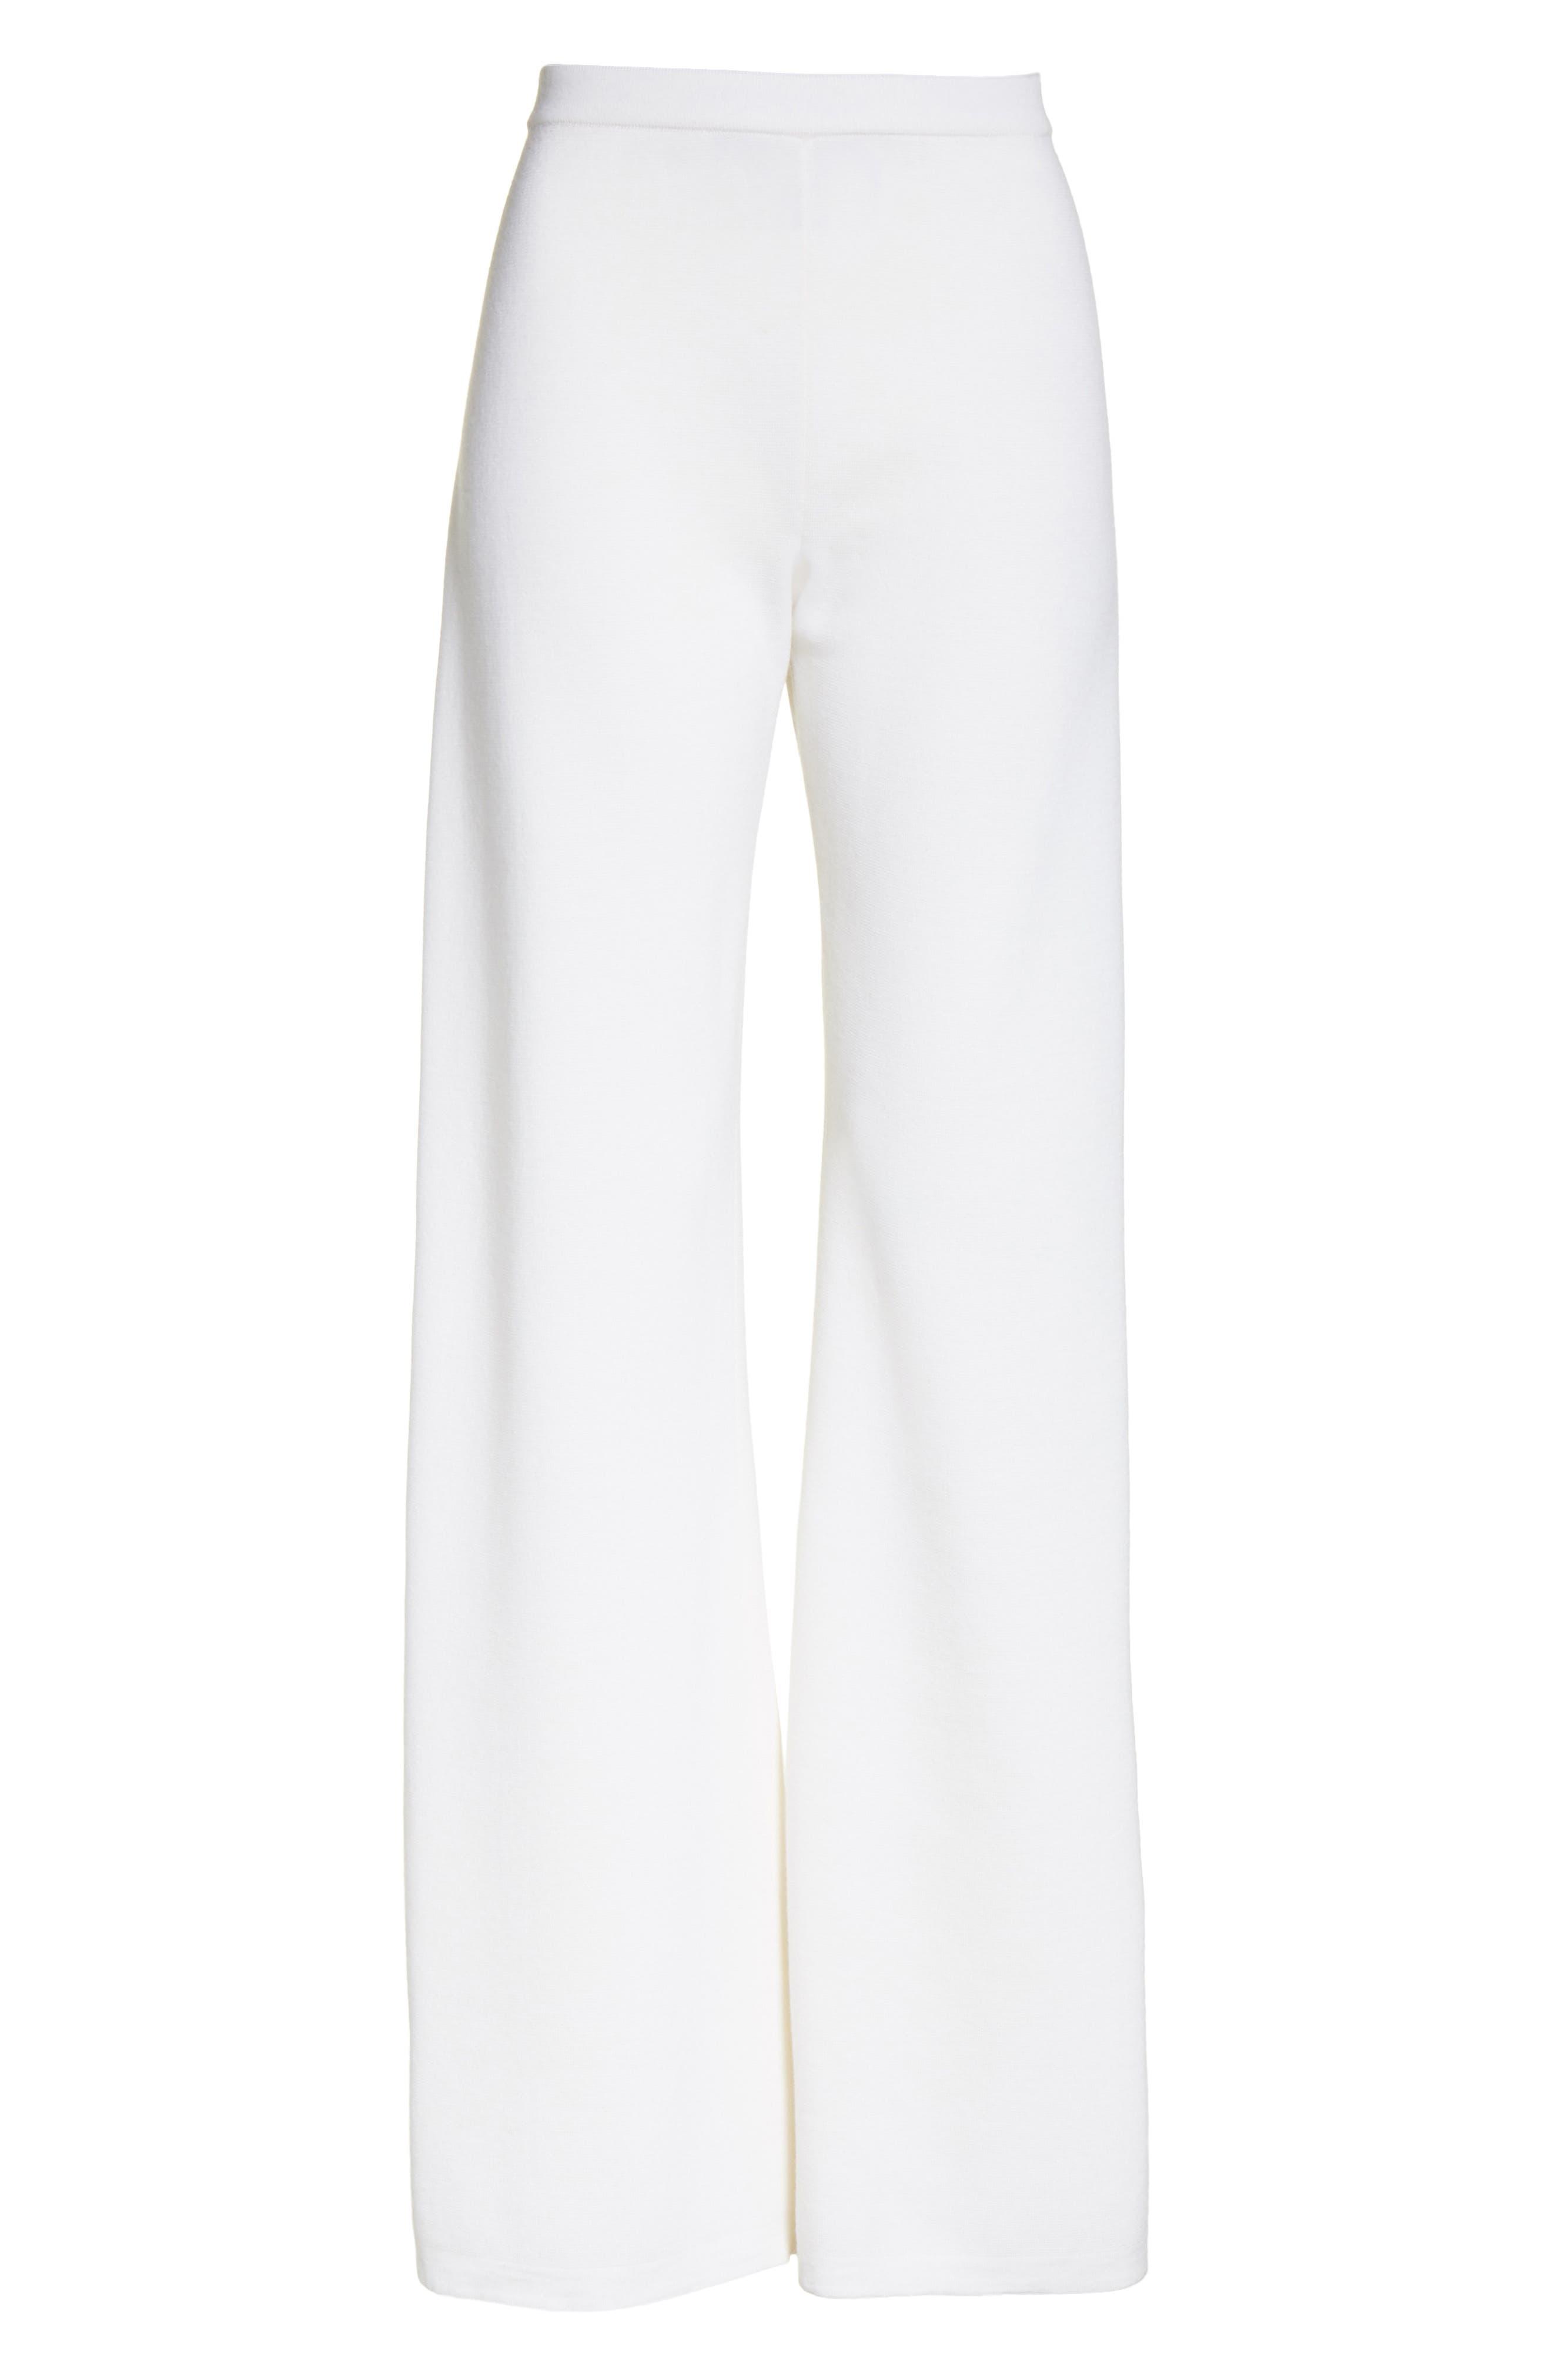 Brando Wool Wide Leg Pants,                             Alternate thumbnail 10, color,                             Silk